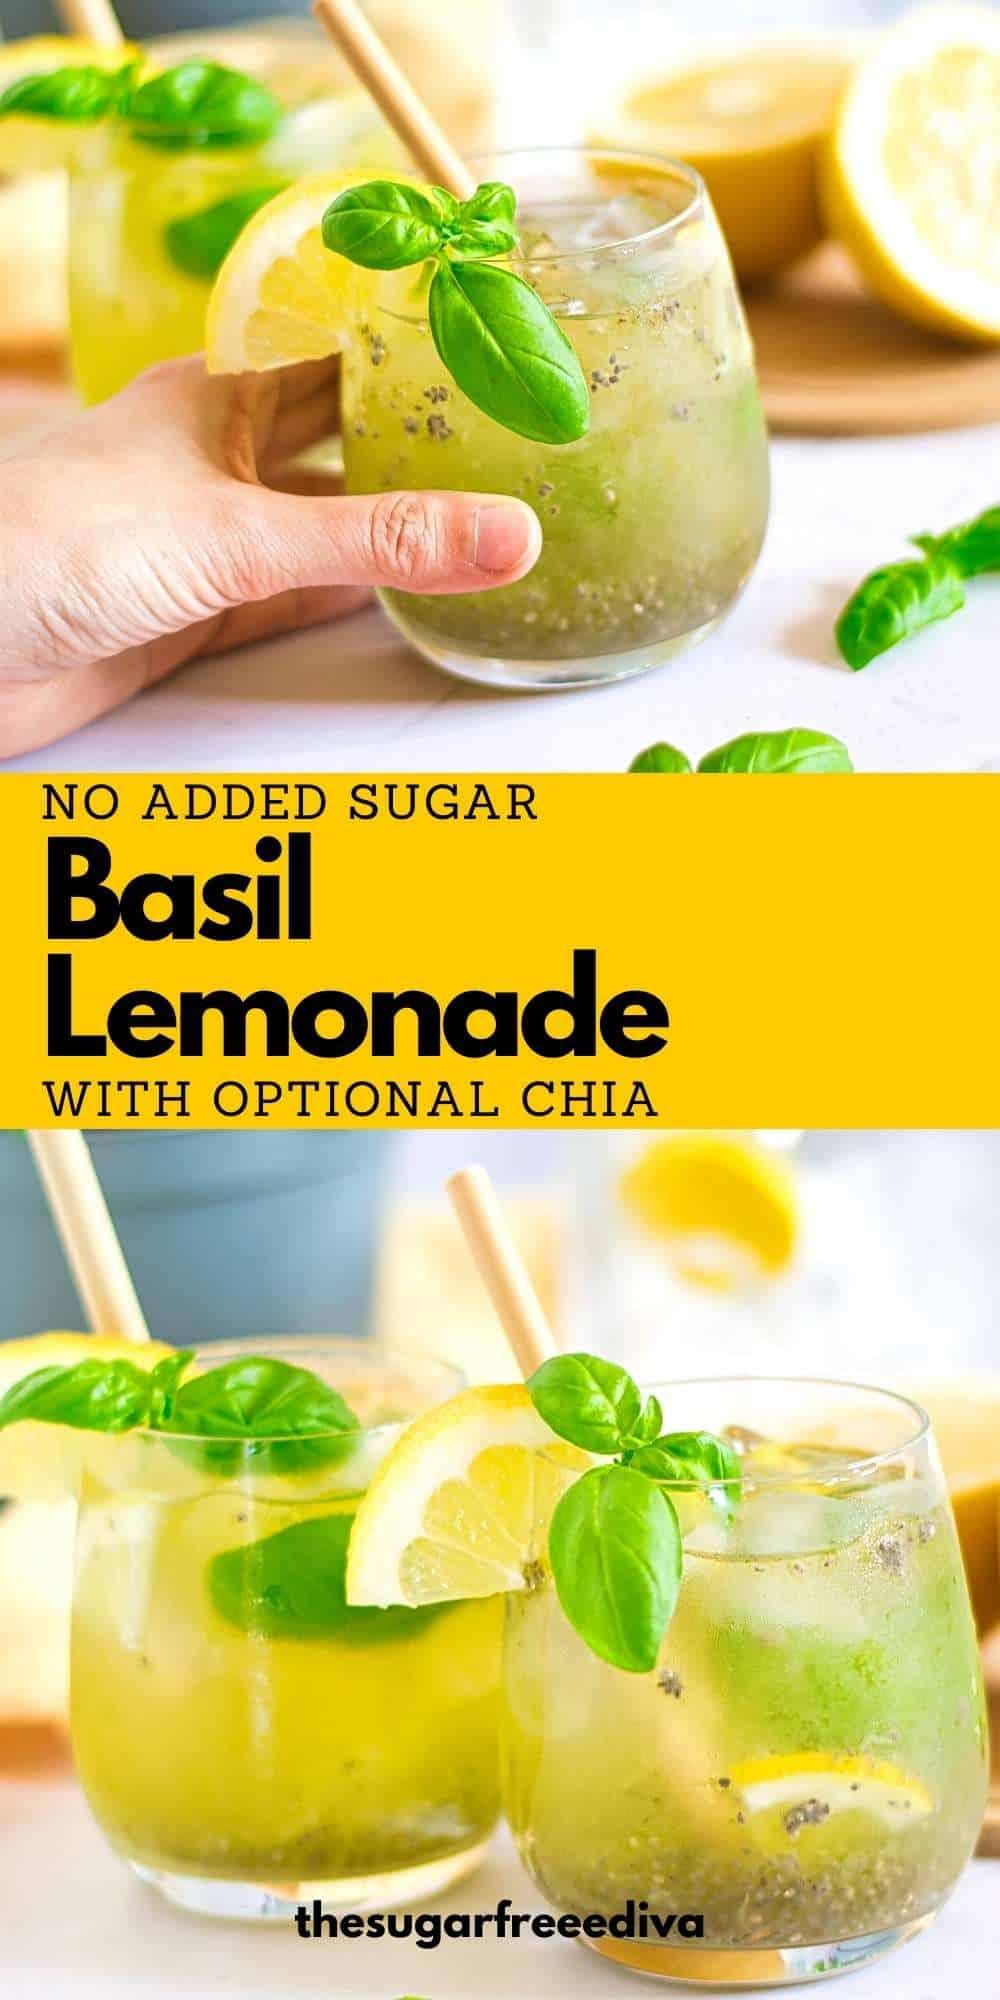 Sugar Free Basil Lemonade